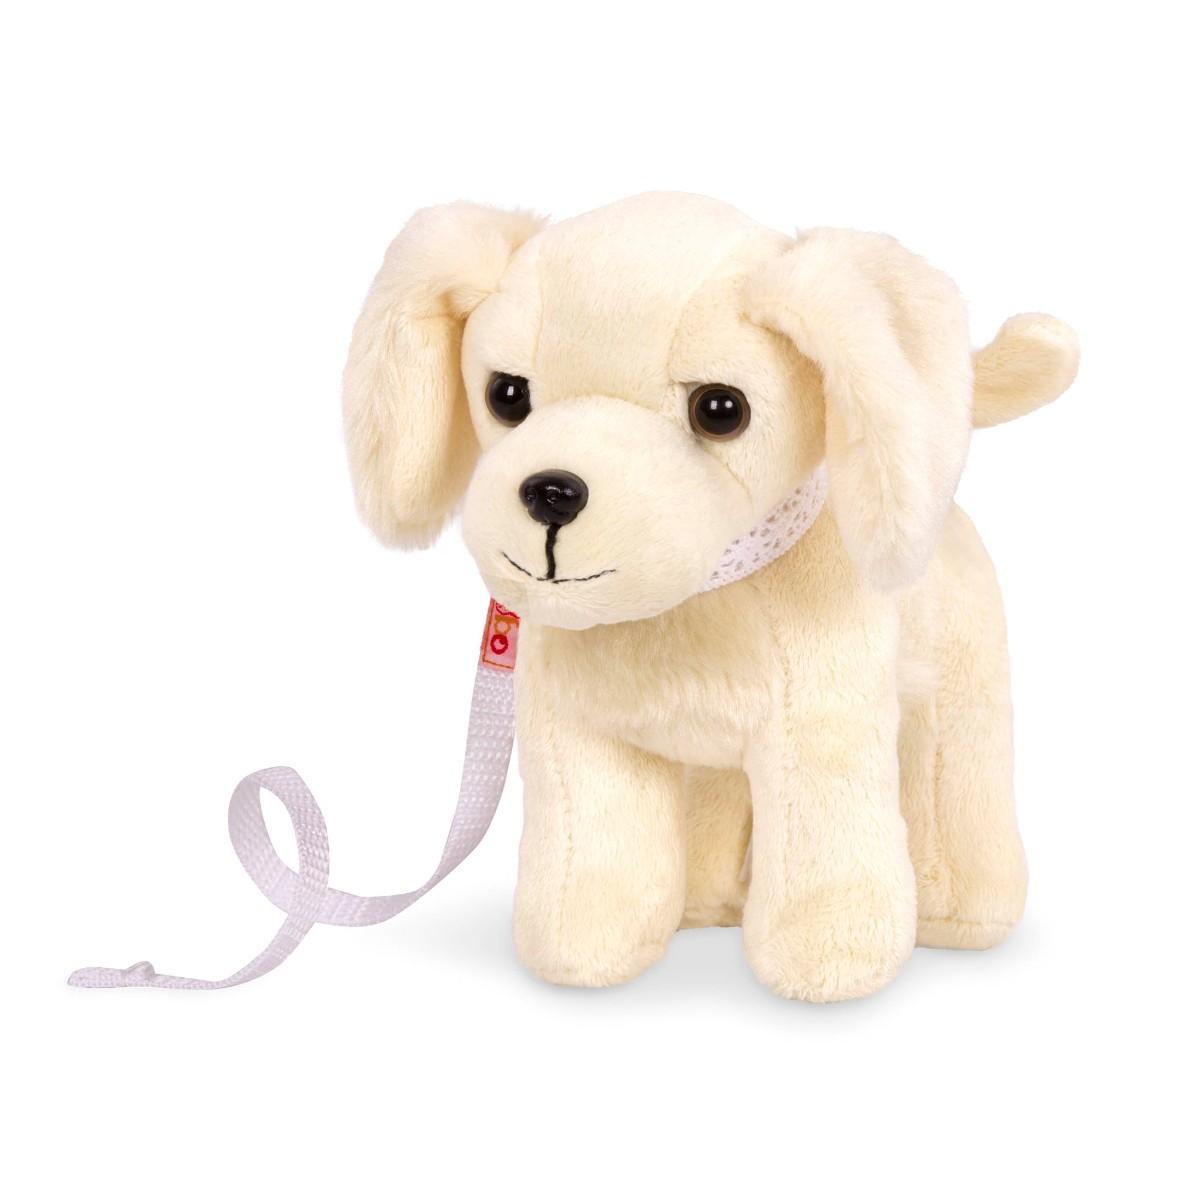 Our Generation - Posable Golden Retriever Puppy (735120)